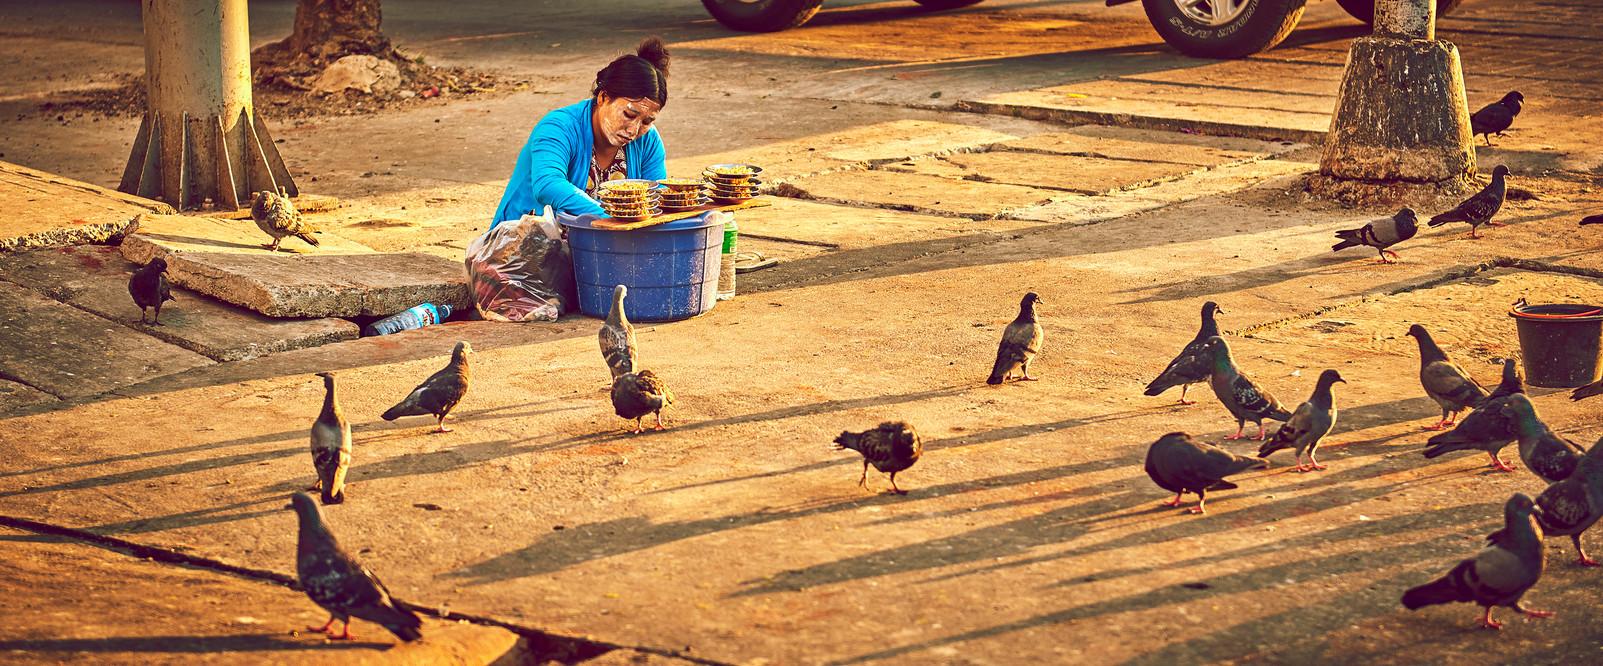 Pigeon girl